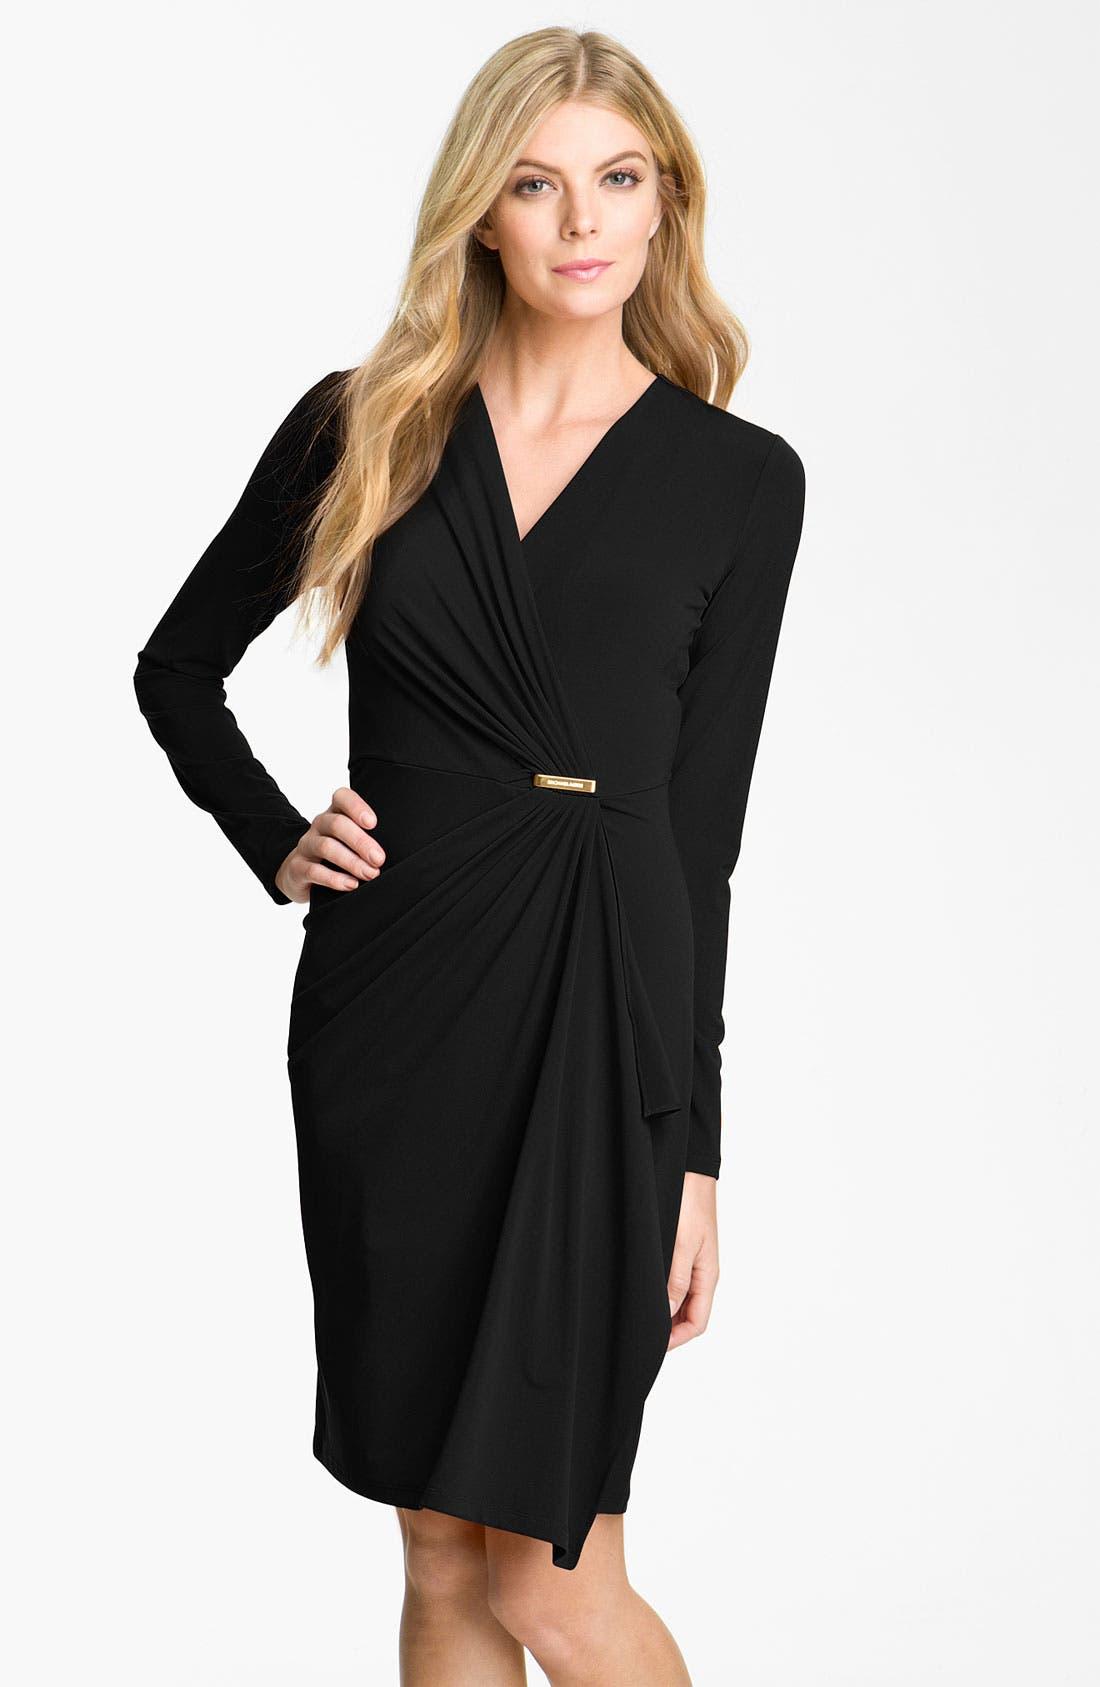 Alternate Image 1 Selected - MICHAEL Michael Kors Long Sleeve Wrap Dress (Plus)